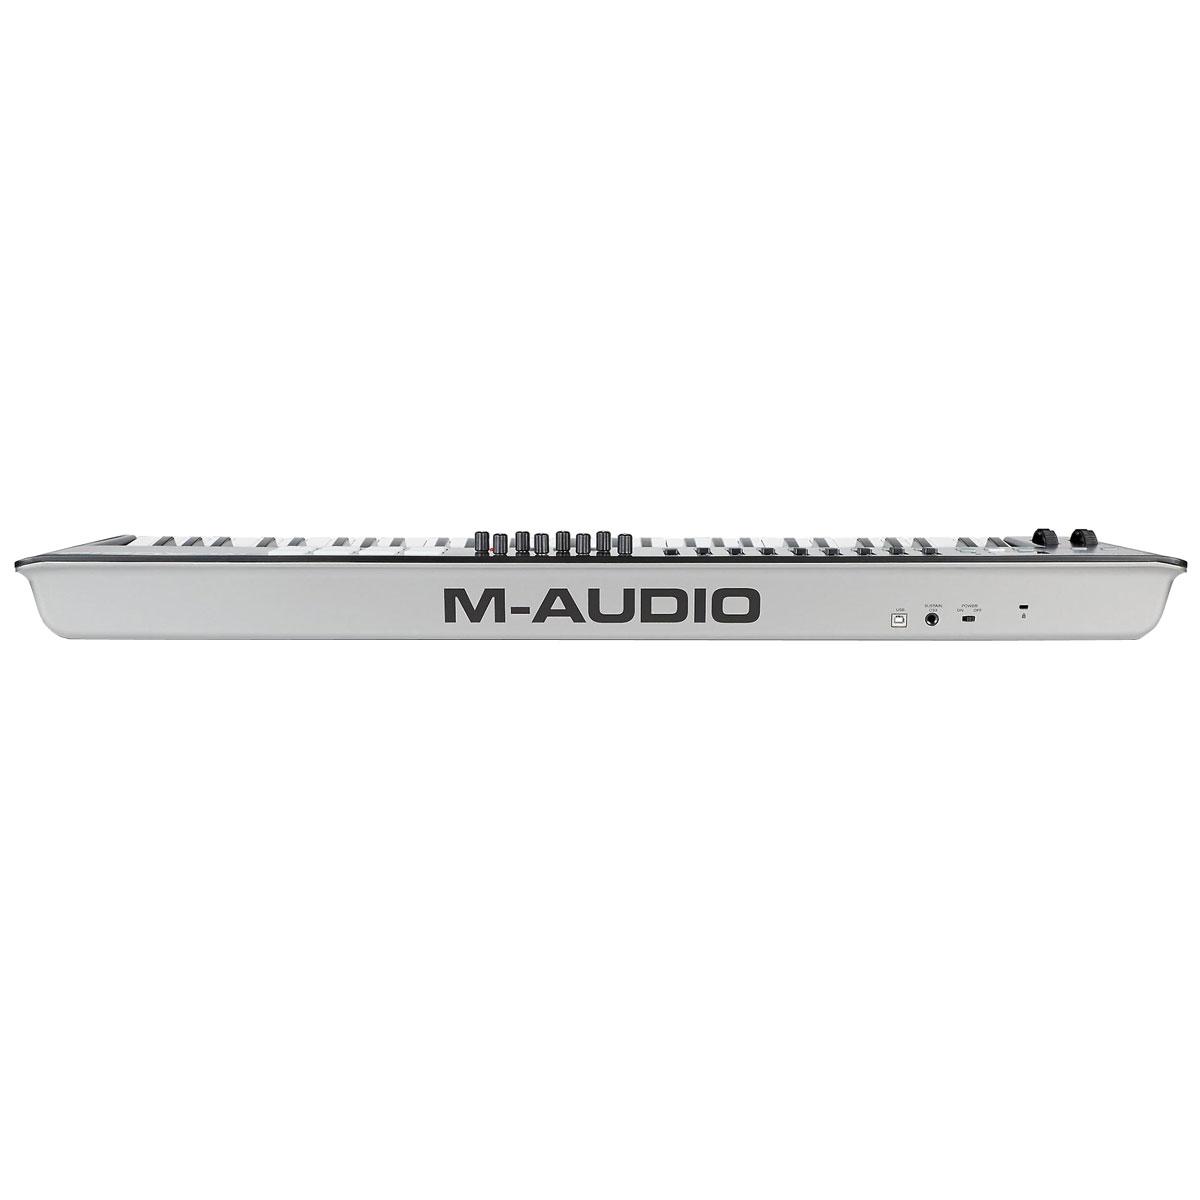 Teclado Controlador MIDI 61 Teclas c/ USB - Oxygen 61 MK IV M-Audio